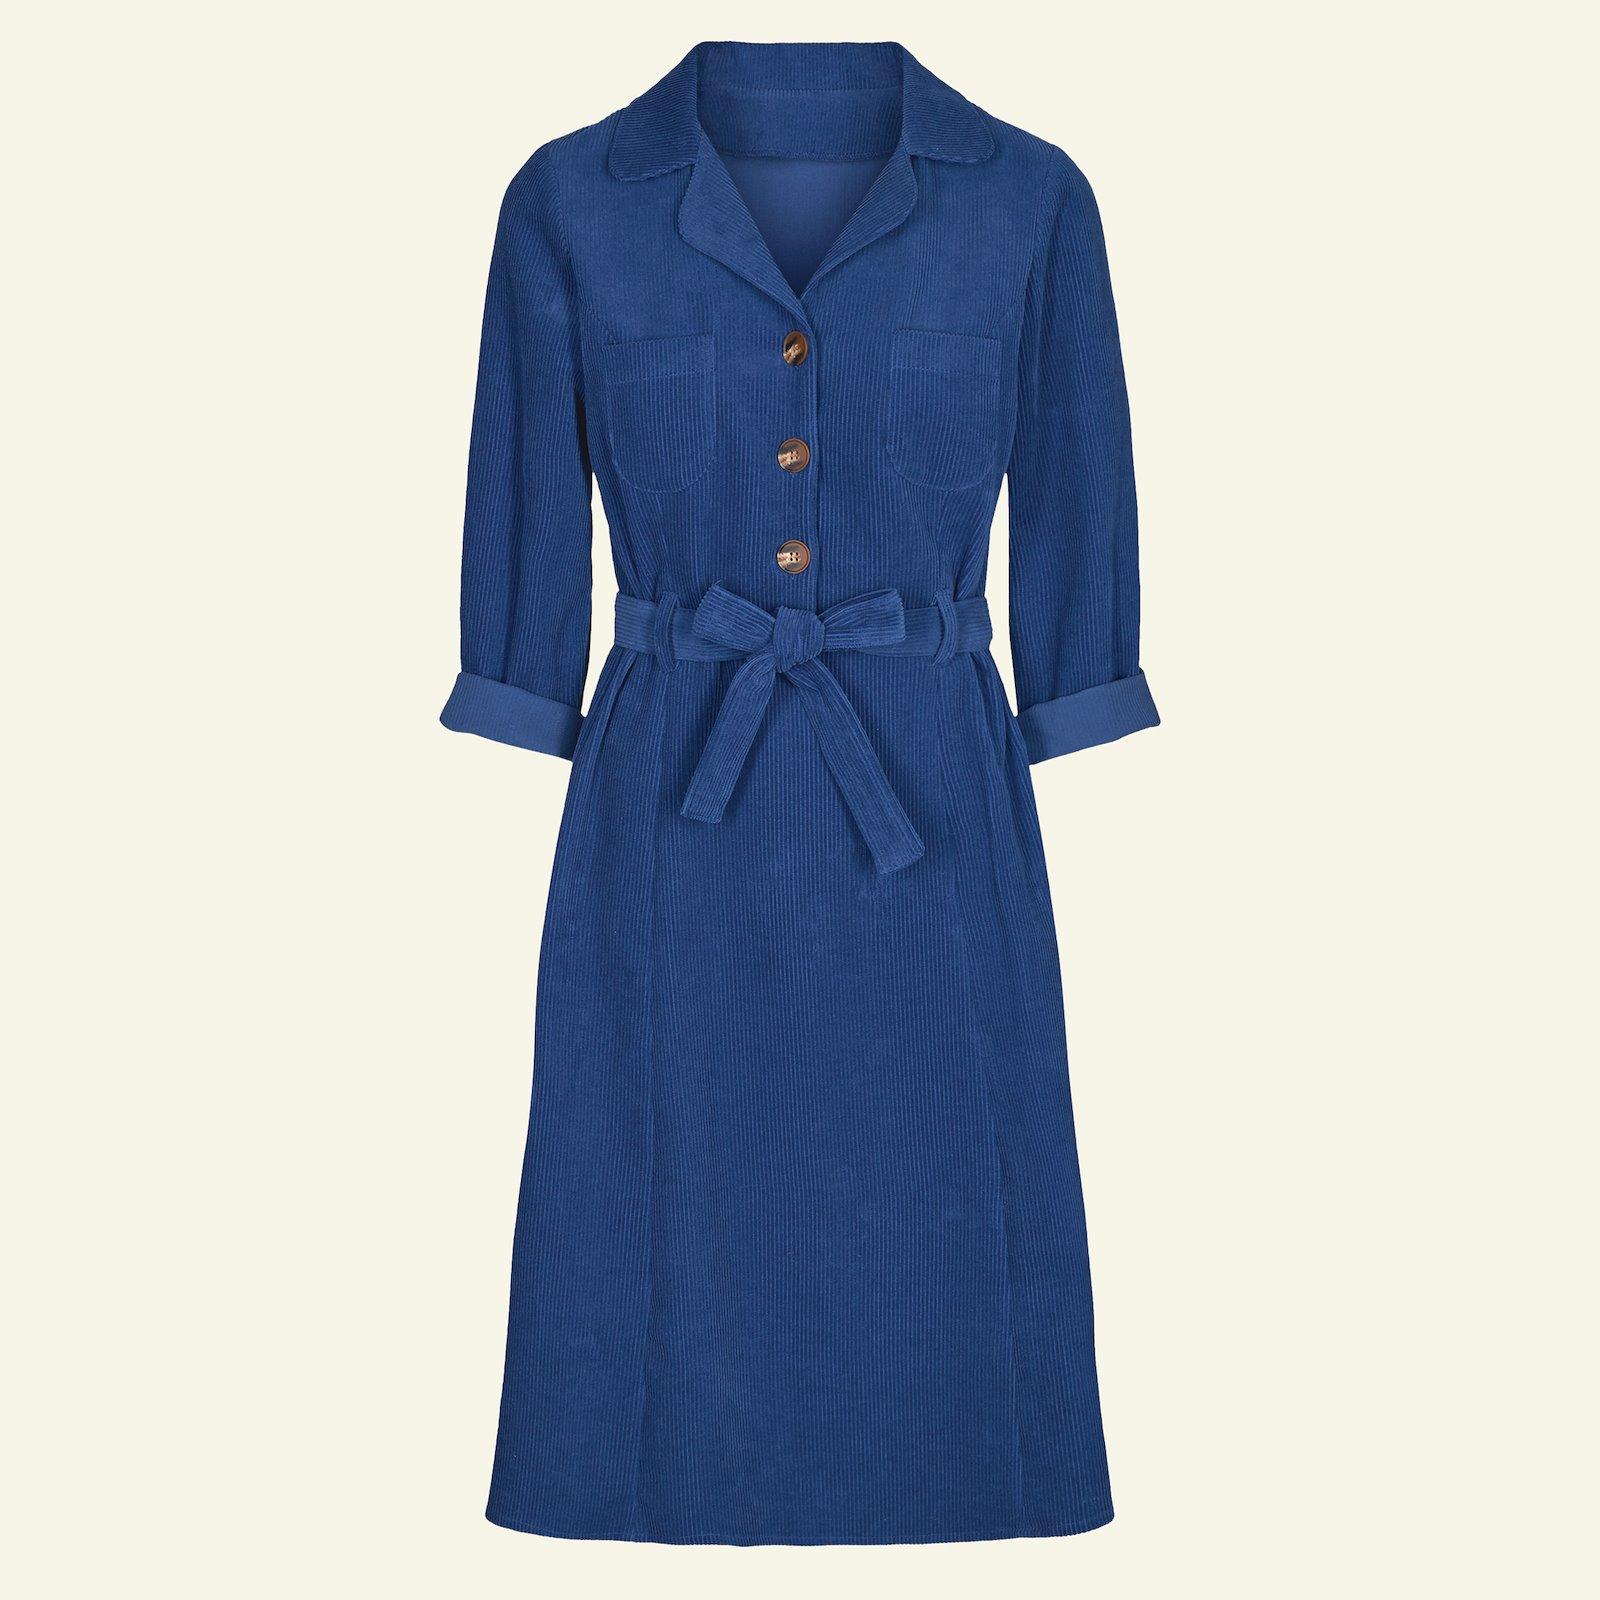 Dress, 38/10 p23075_430820_40243_sskit